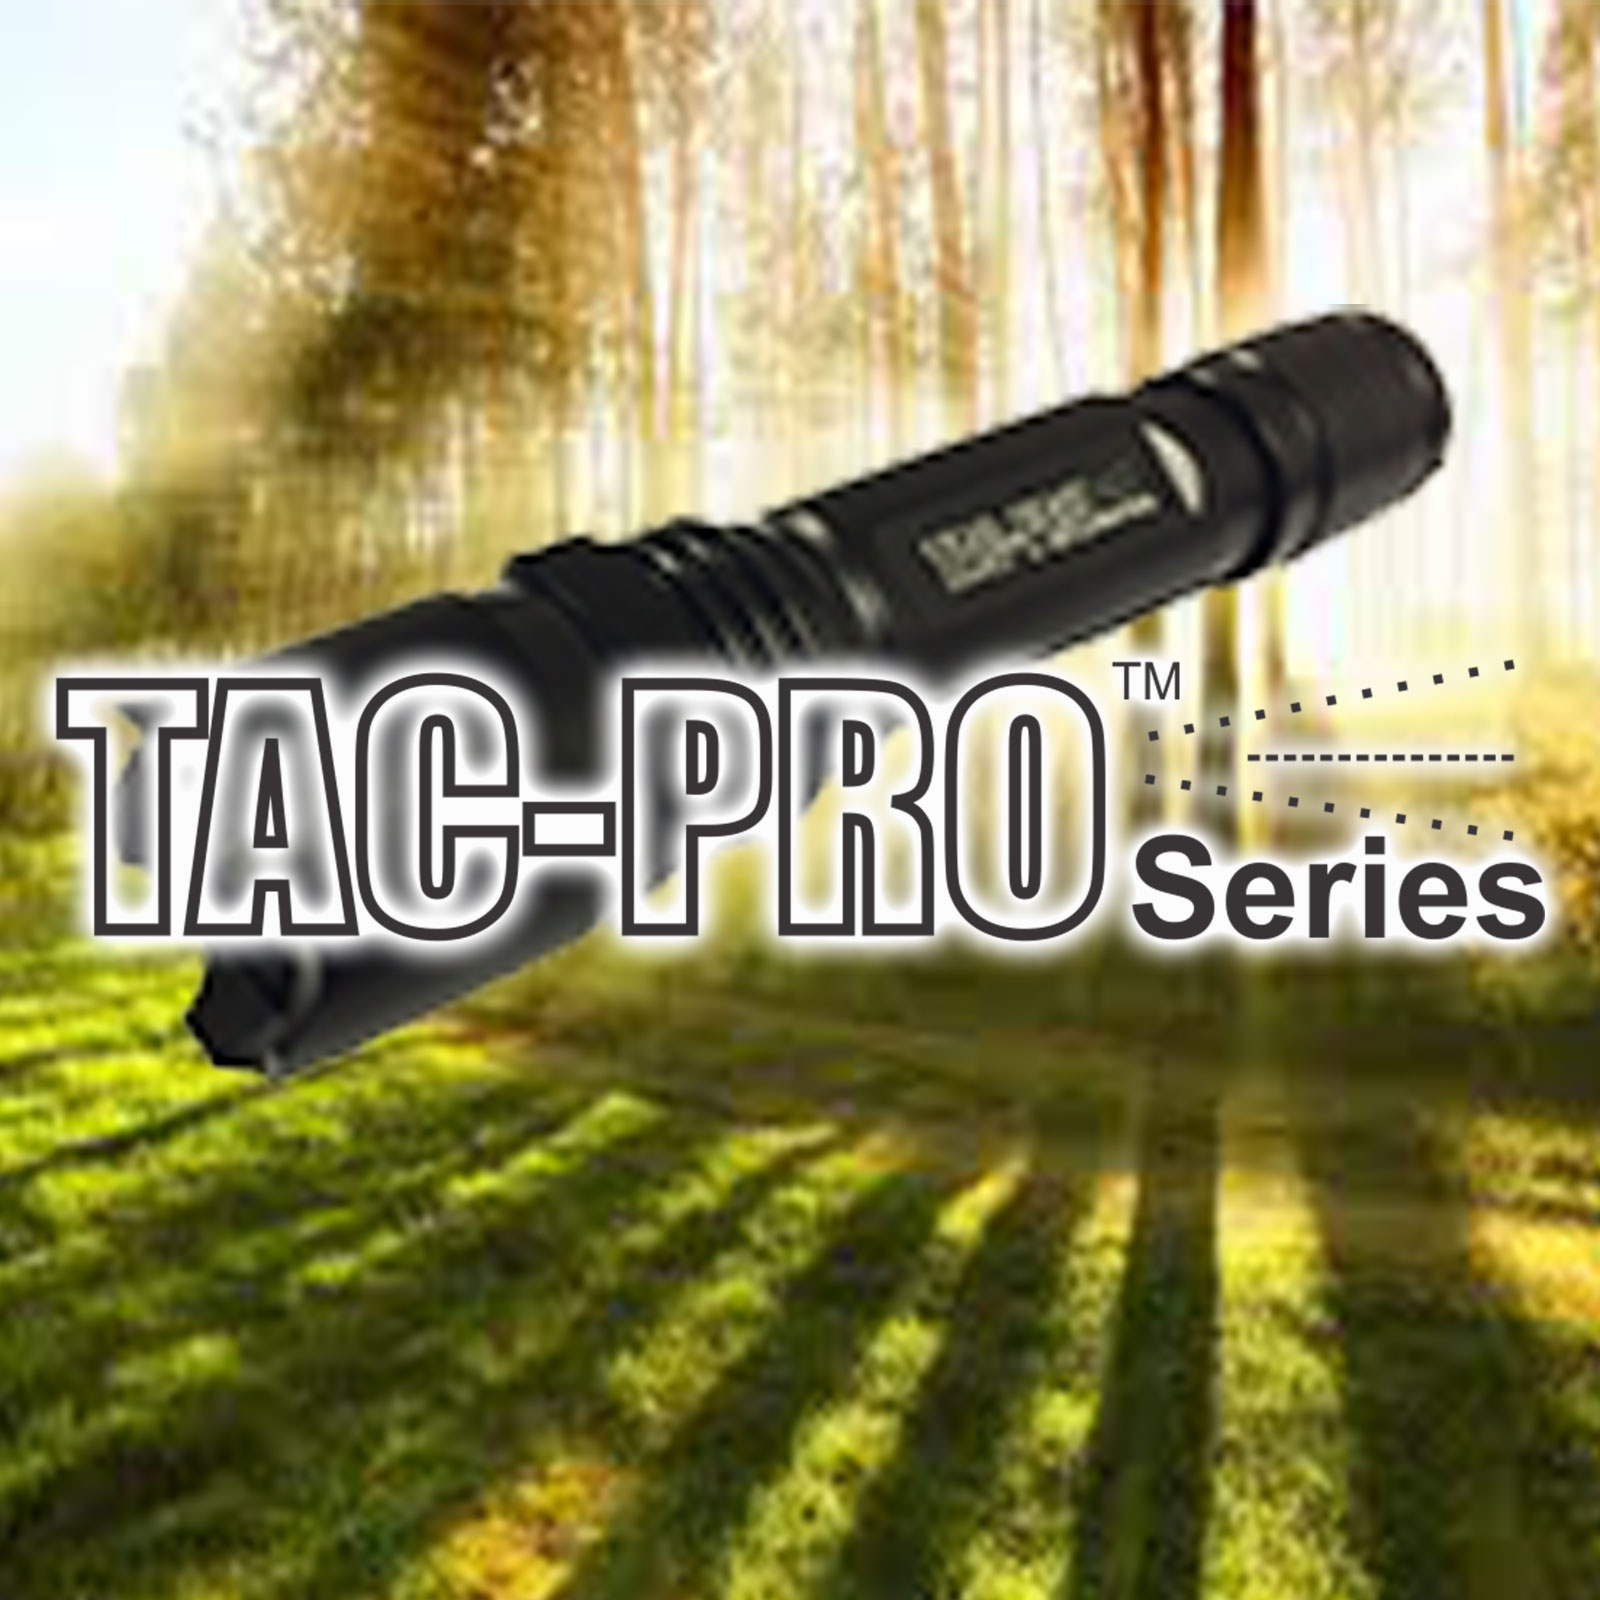 Tac-Pro